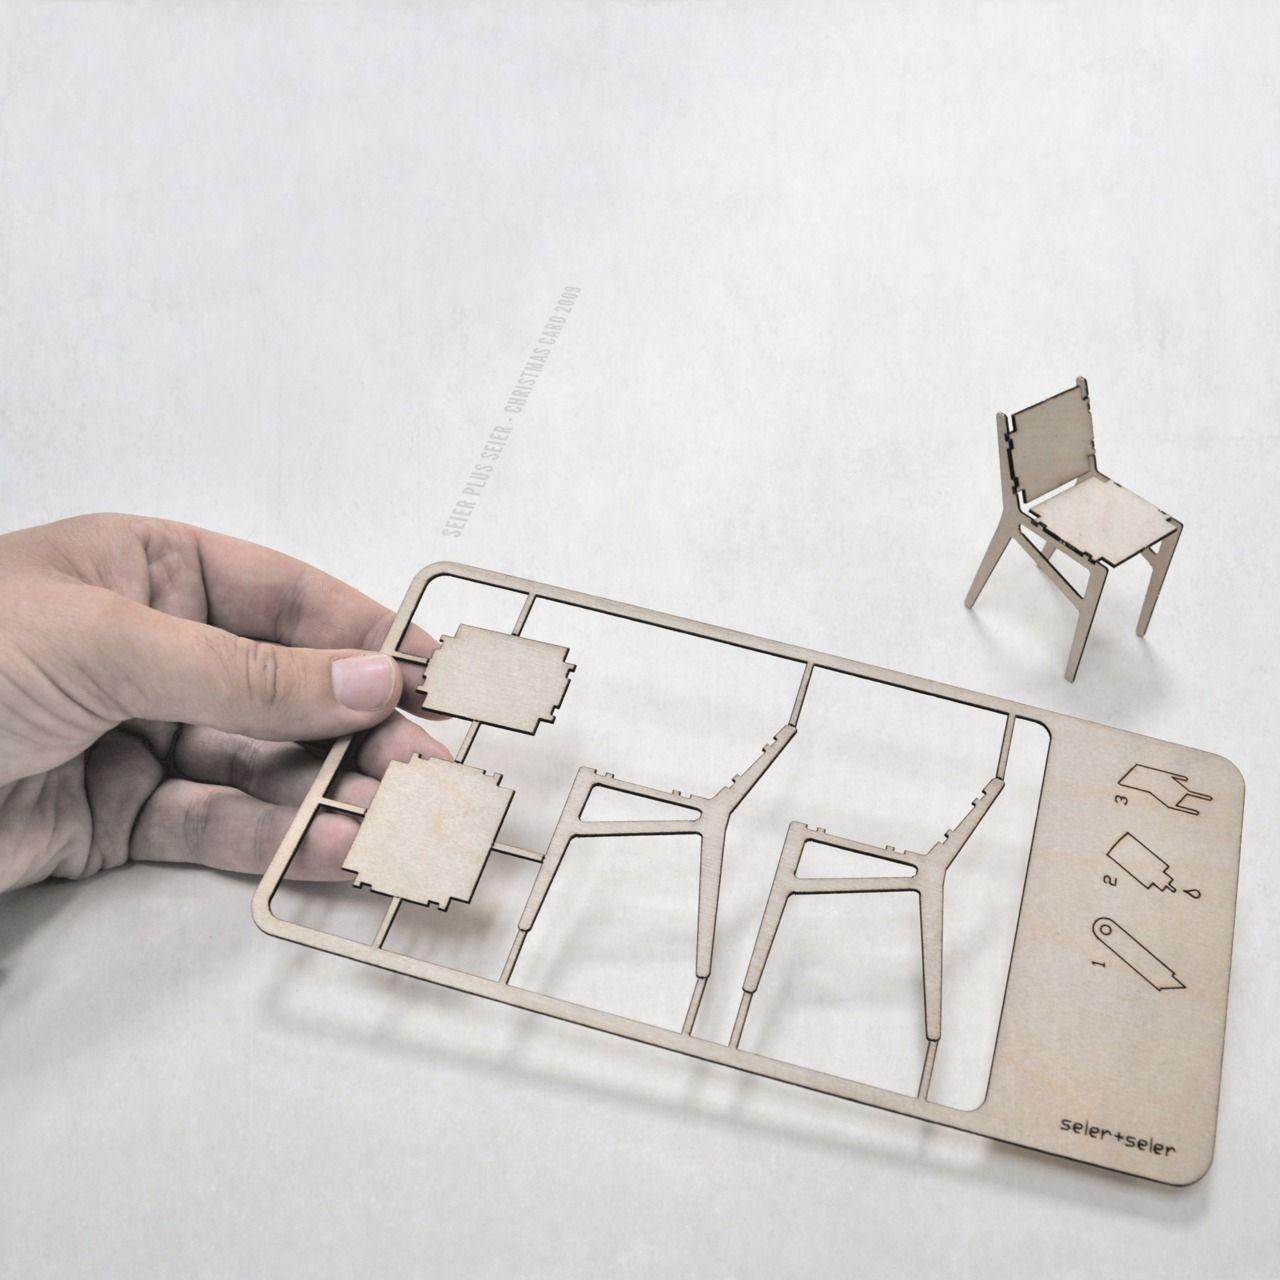 Plywood Chair Christmas Card Seier + Seier 2009 laser cut plywood ...